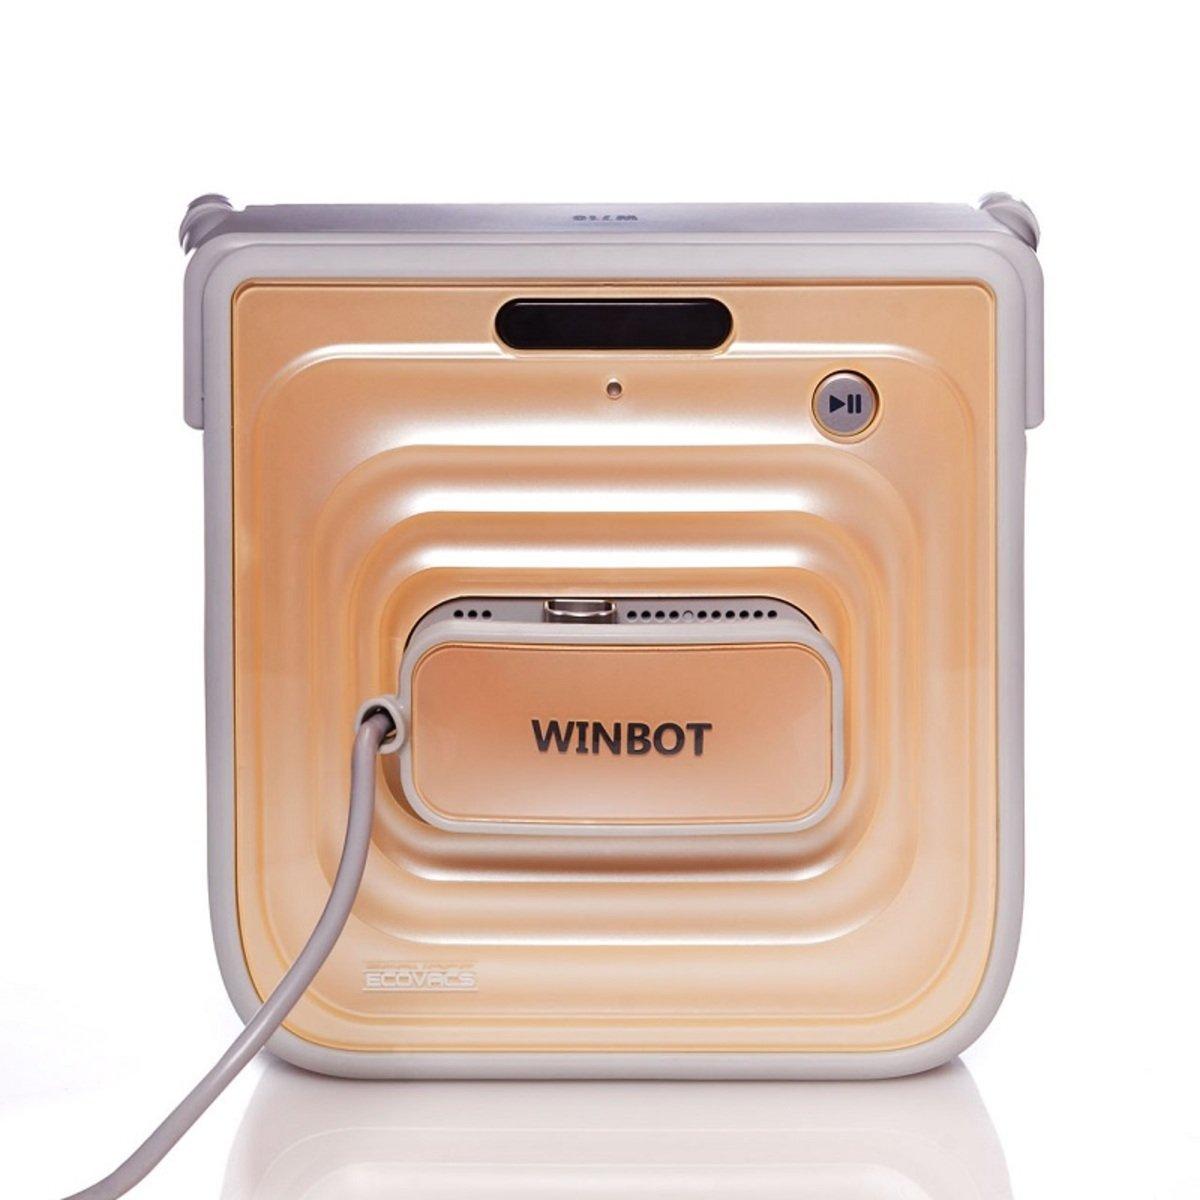 W710 抹窗機械人